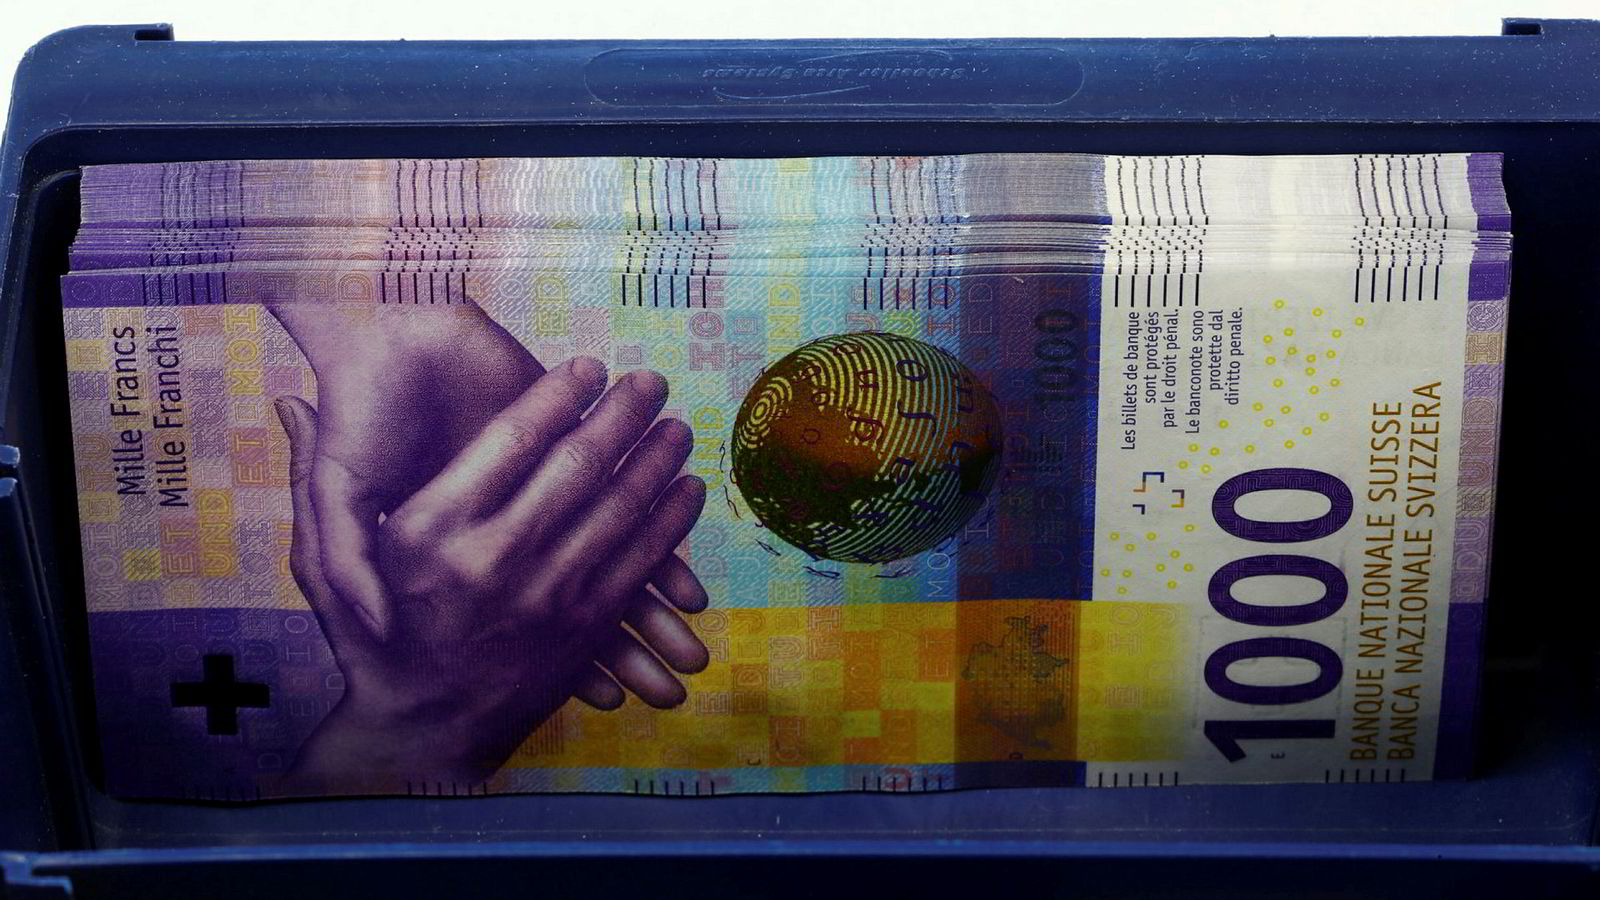 I forbindelse med finanskrisen høsten 2008 økte kursen på sveitserfranc markant mot norske kroner, og valutalånet vokste dermed kraftig målt i norske kroner for et ektepar fra Sunnmøre.